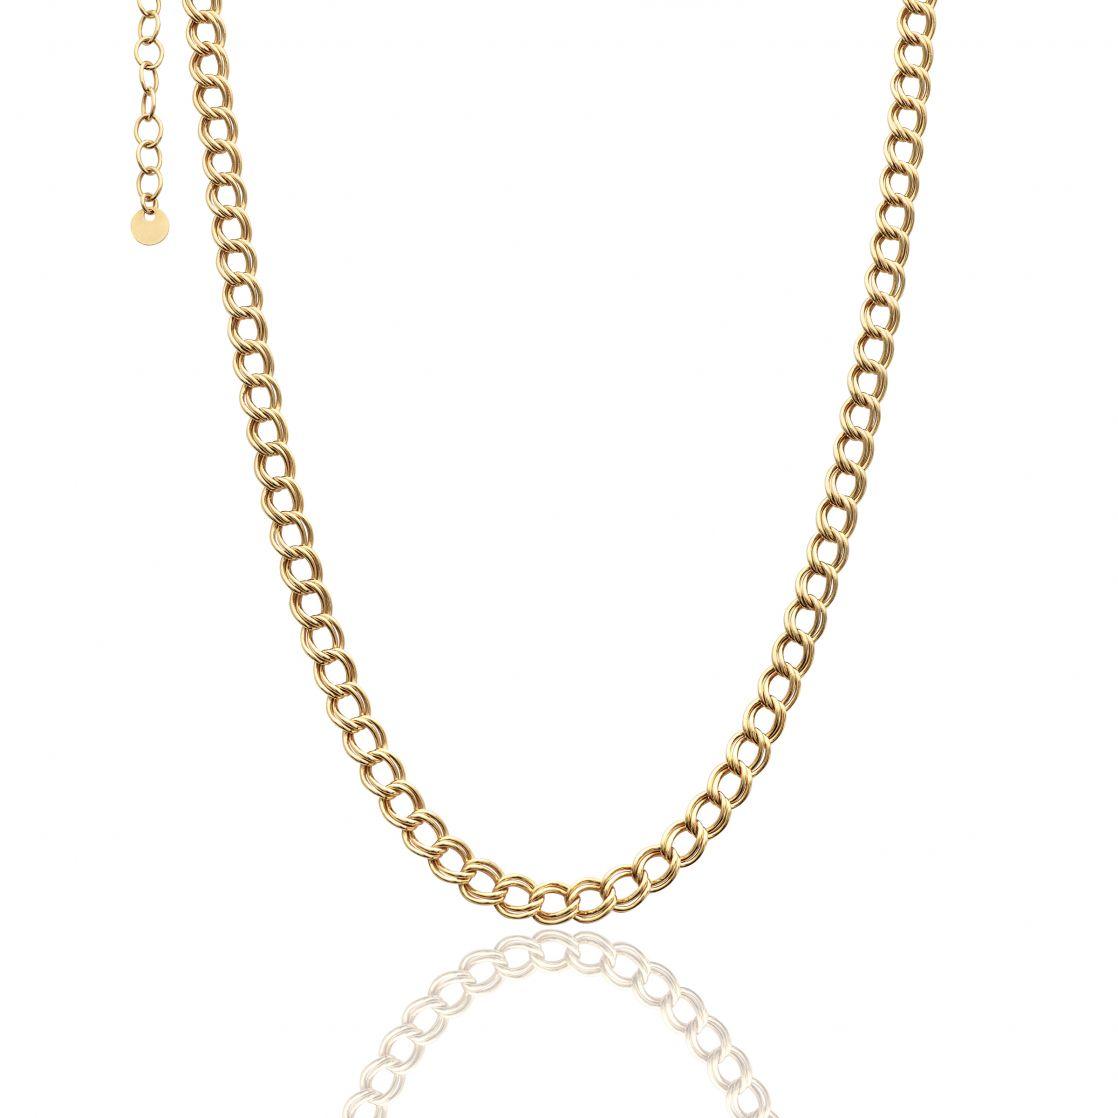 Charm link chain